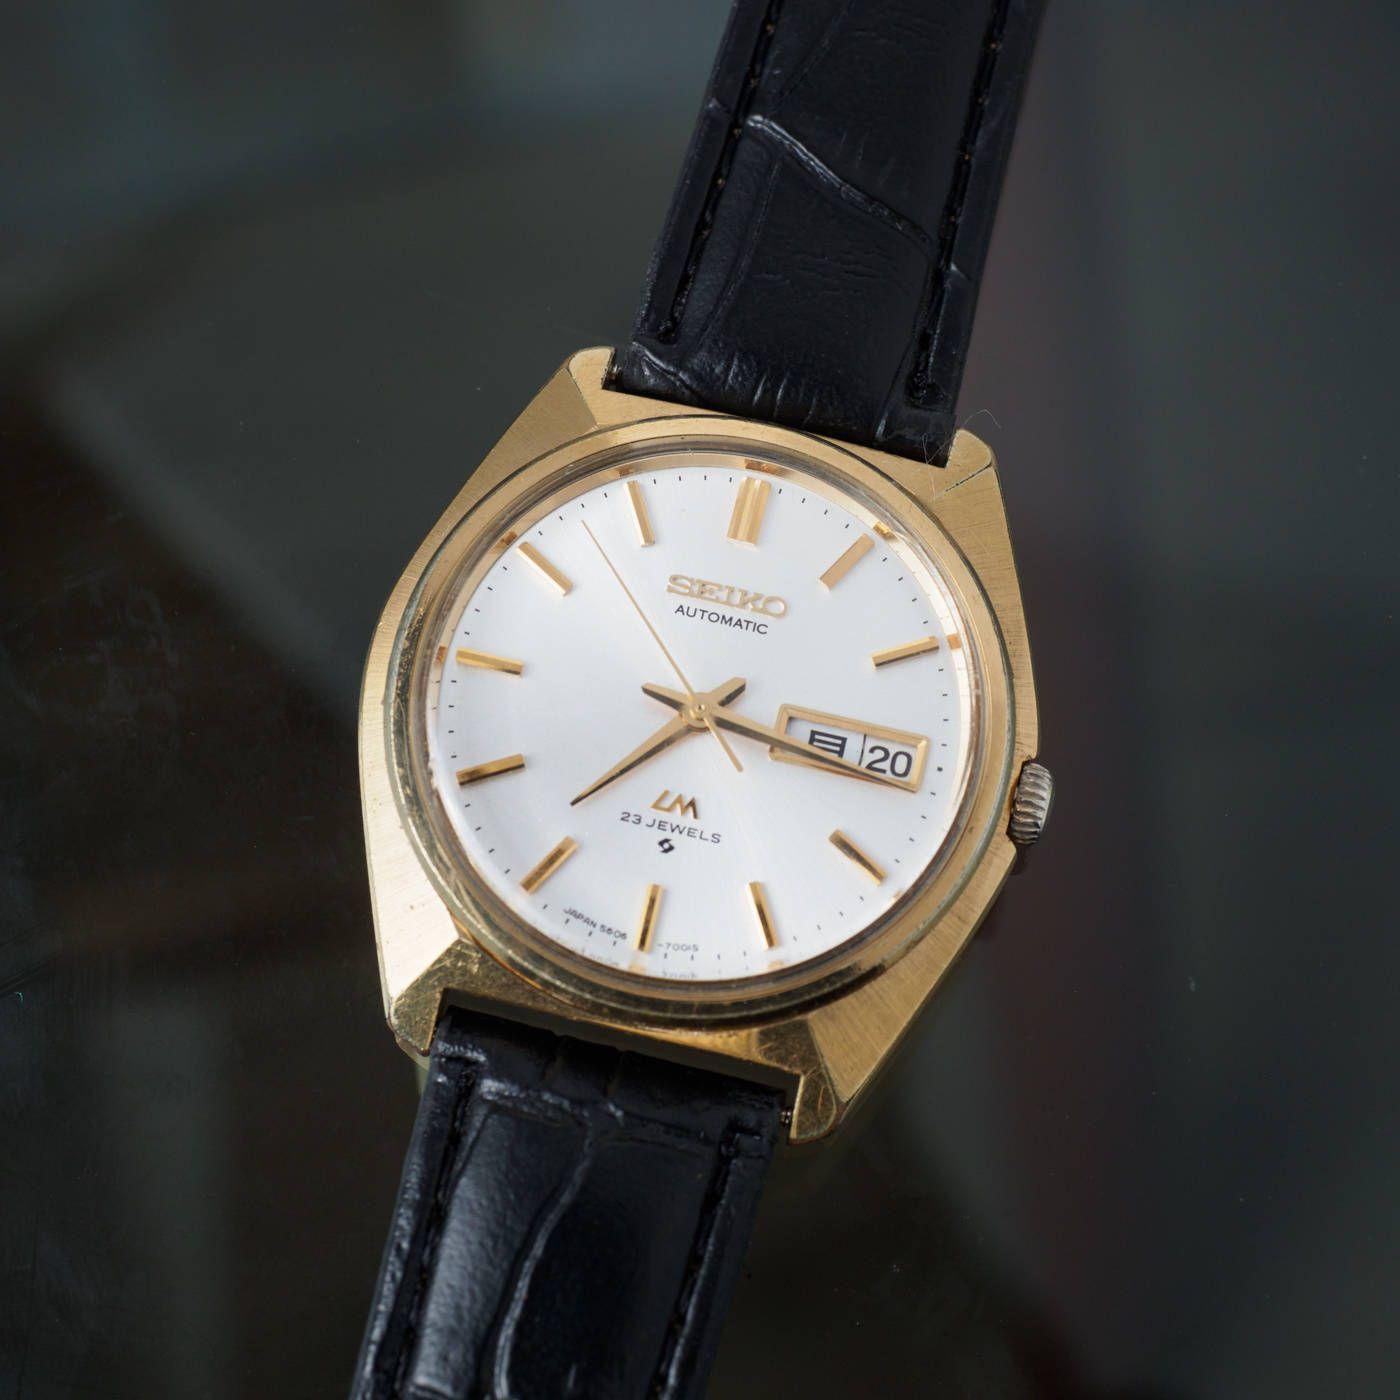 8fd8f9cb457 Etsy のSeiko Lord Matic LM 5606-7000 Vintage JDM Kanji Calendar Automatic  Watch Limited Serviced(ショップ名:ArbitroWatch)